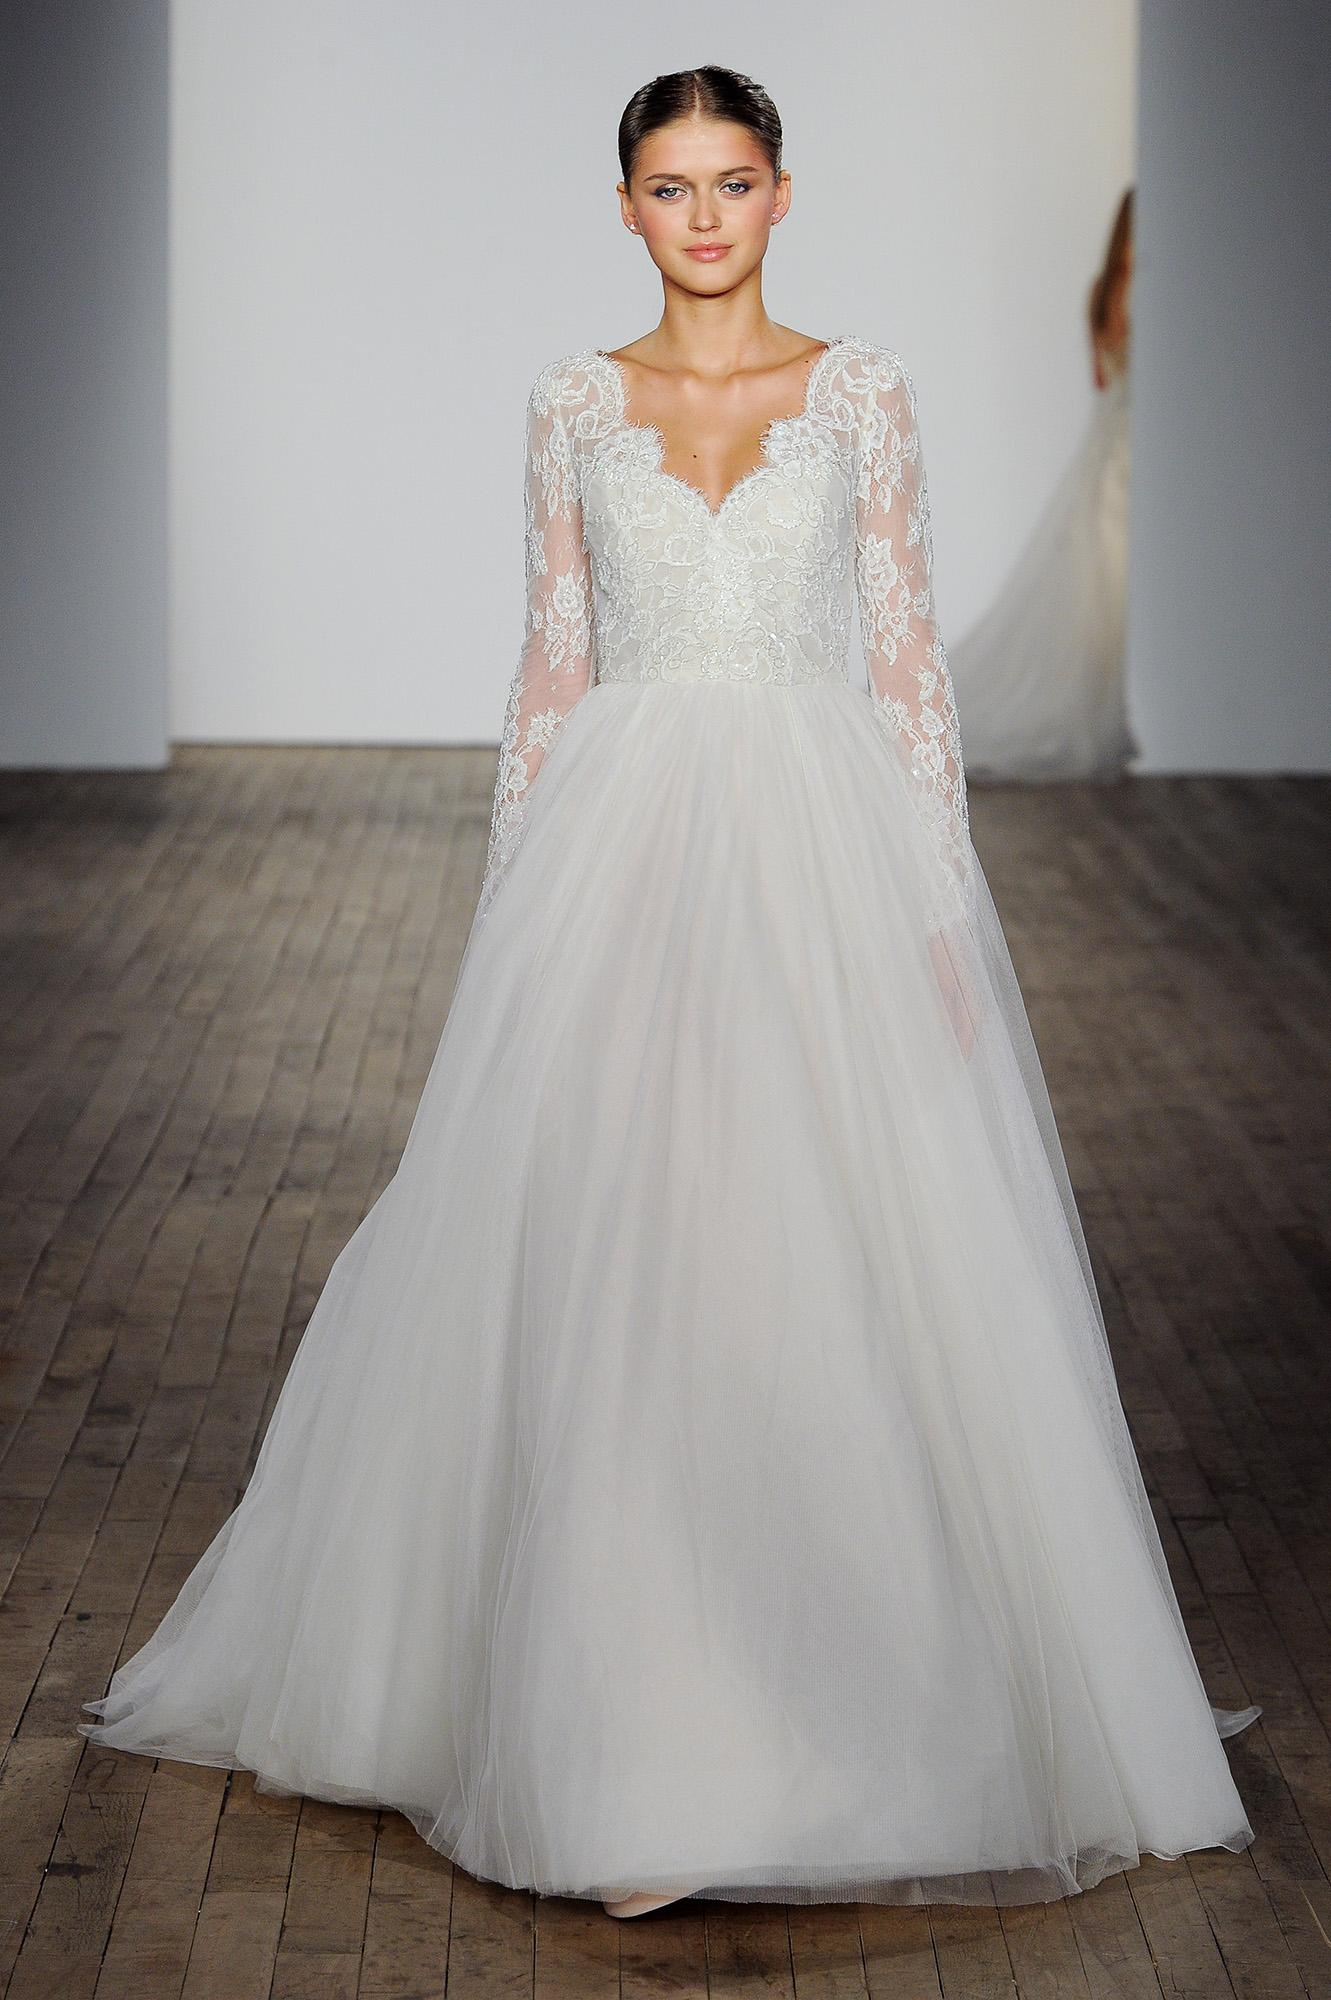 allison webb wedding dress v-neck lace long sleeves tulle a-line